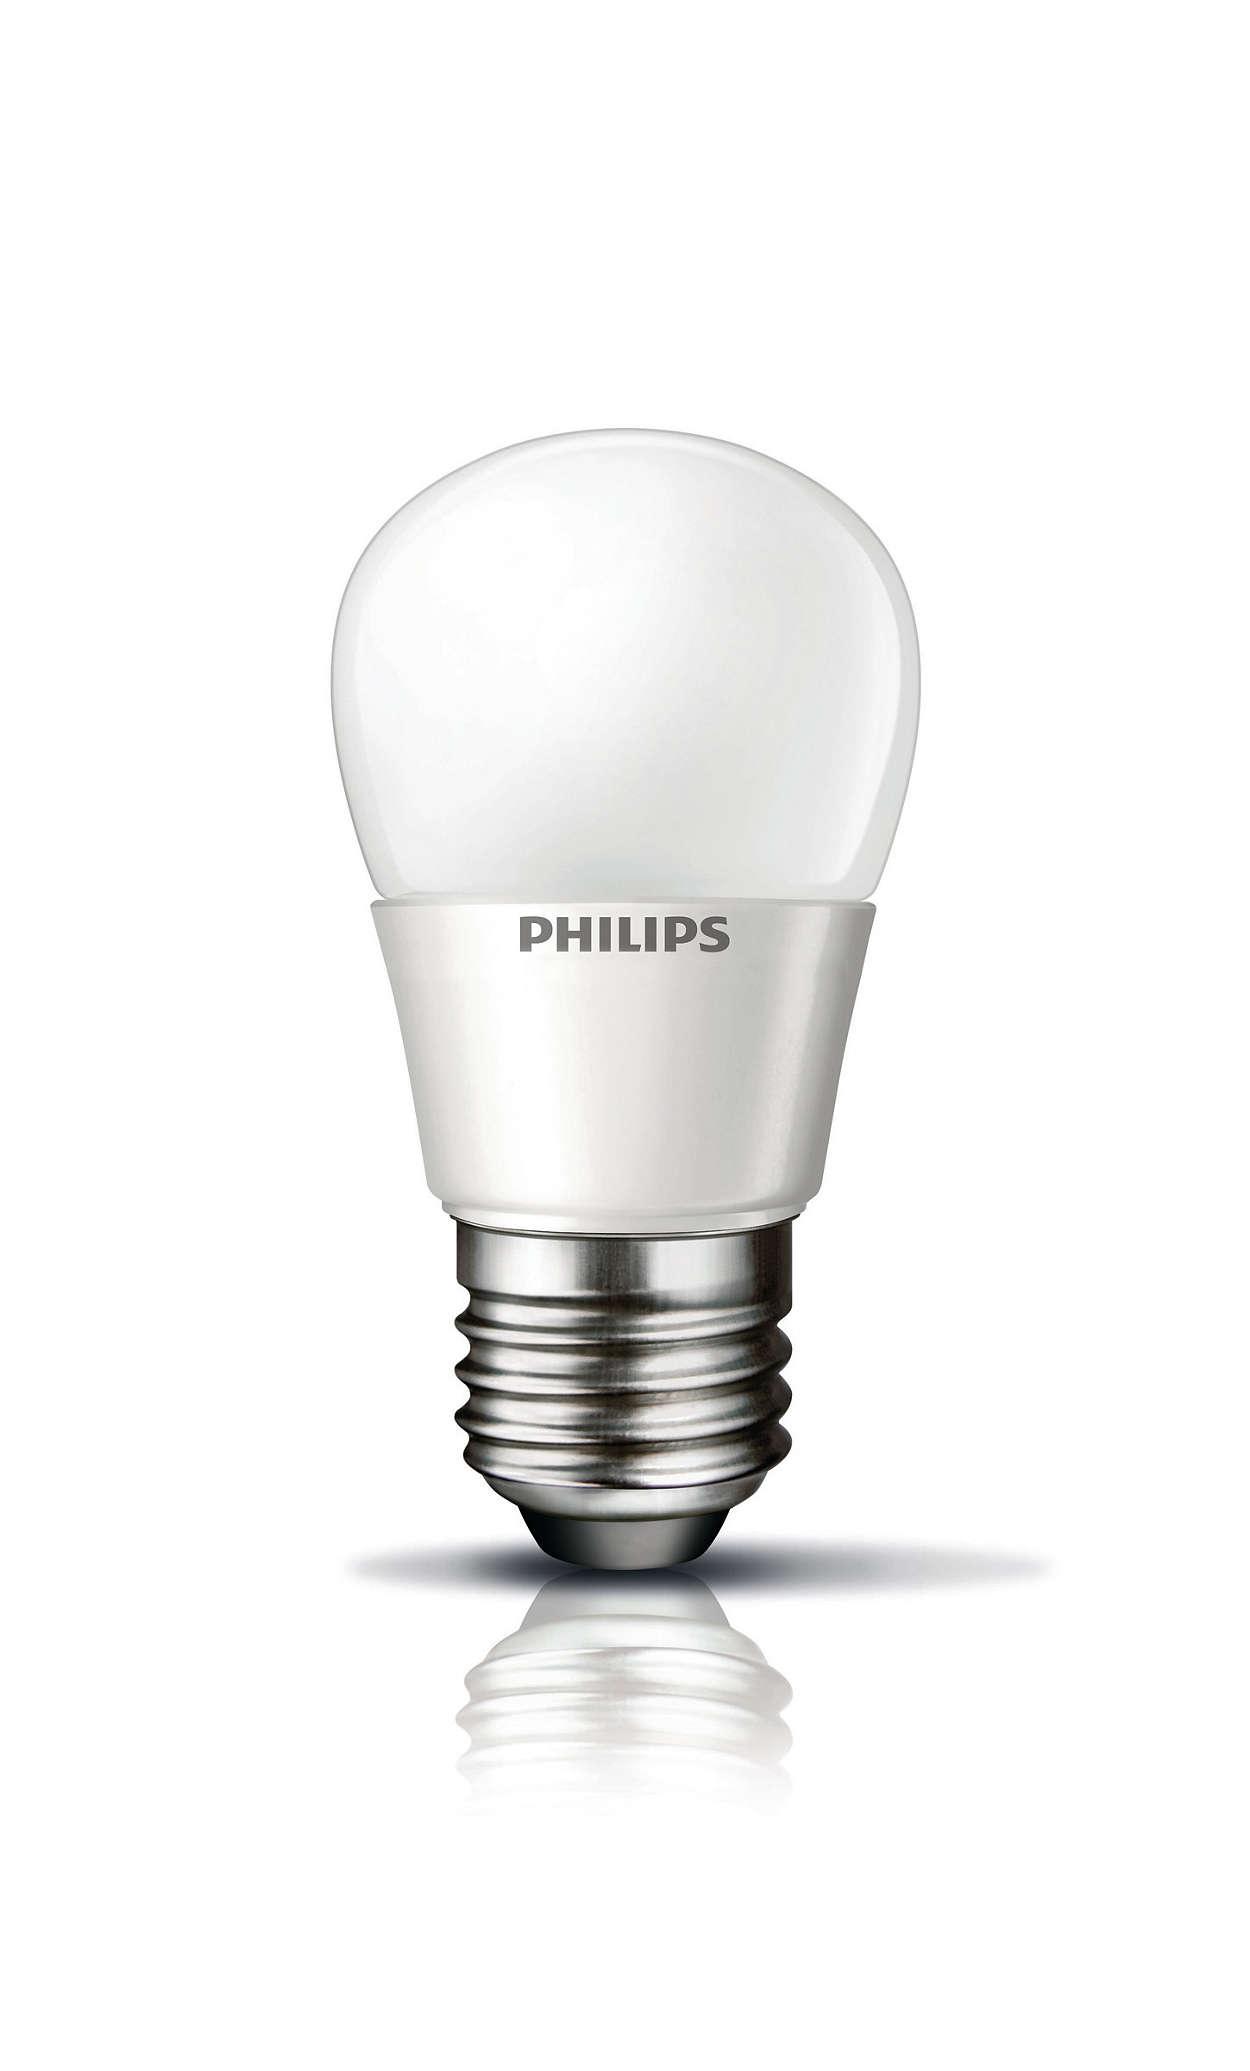 Úspora energie bez kompromisů